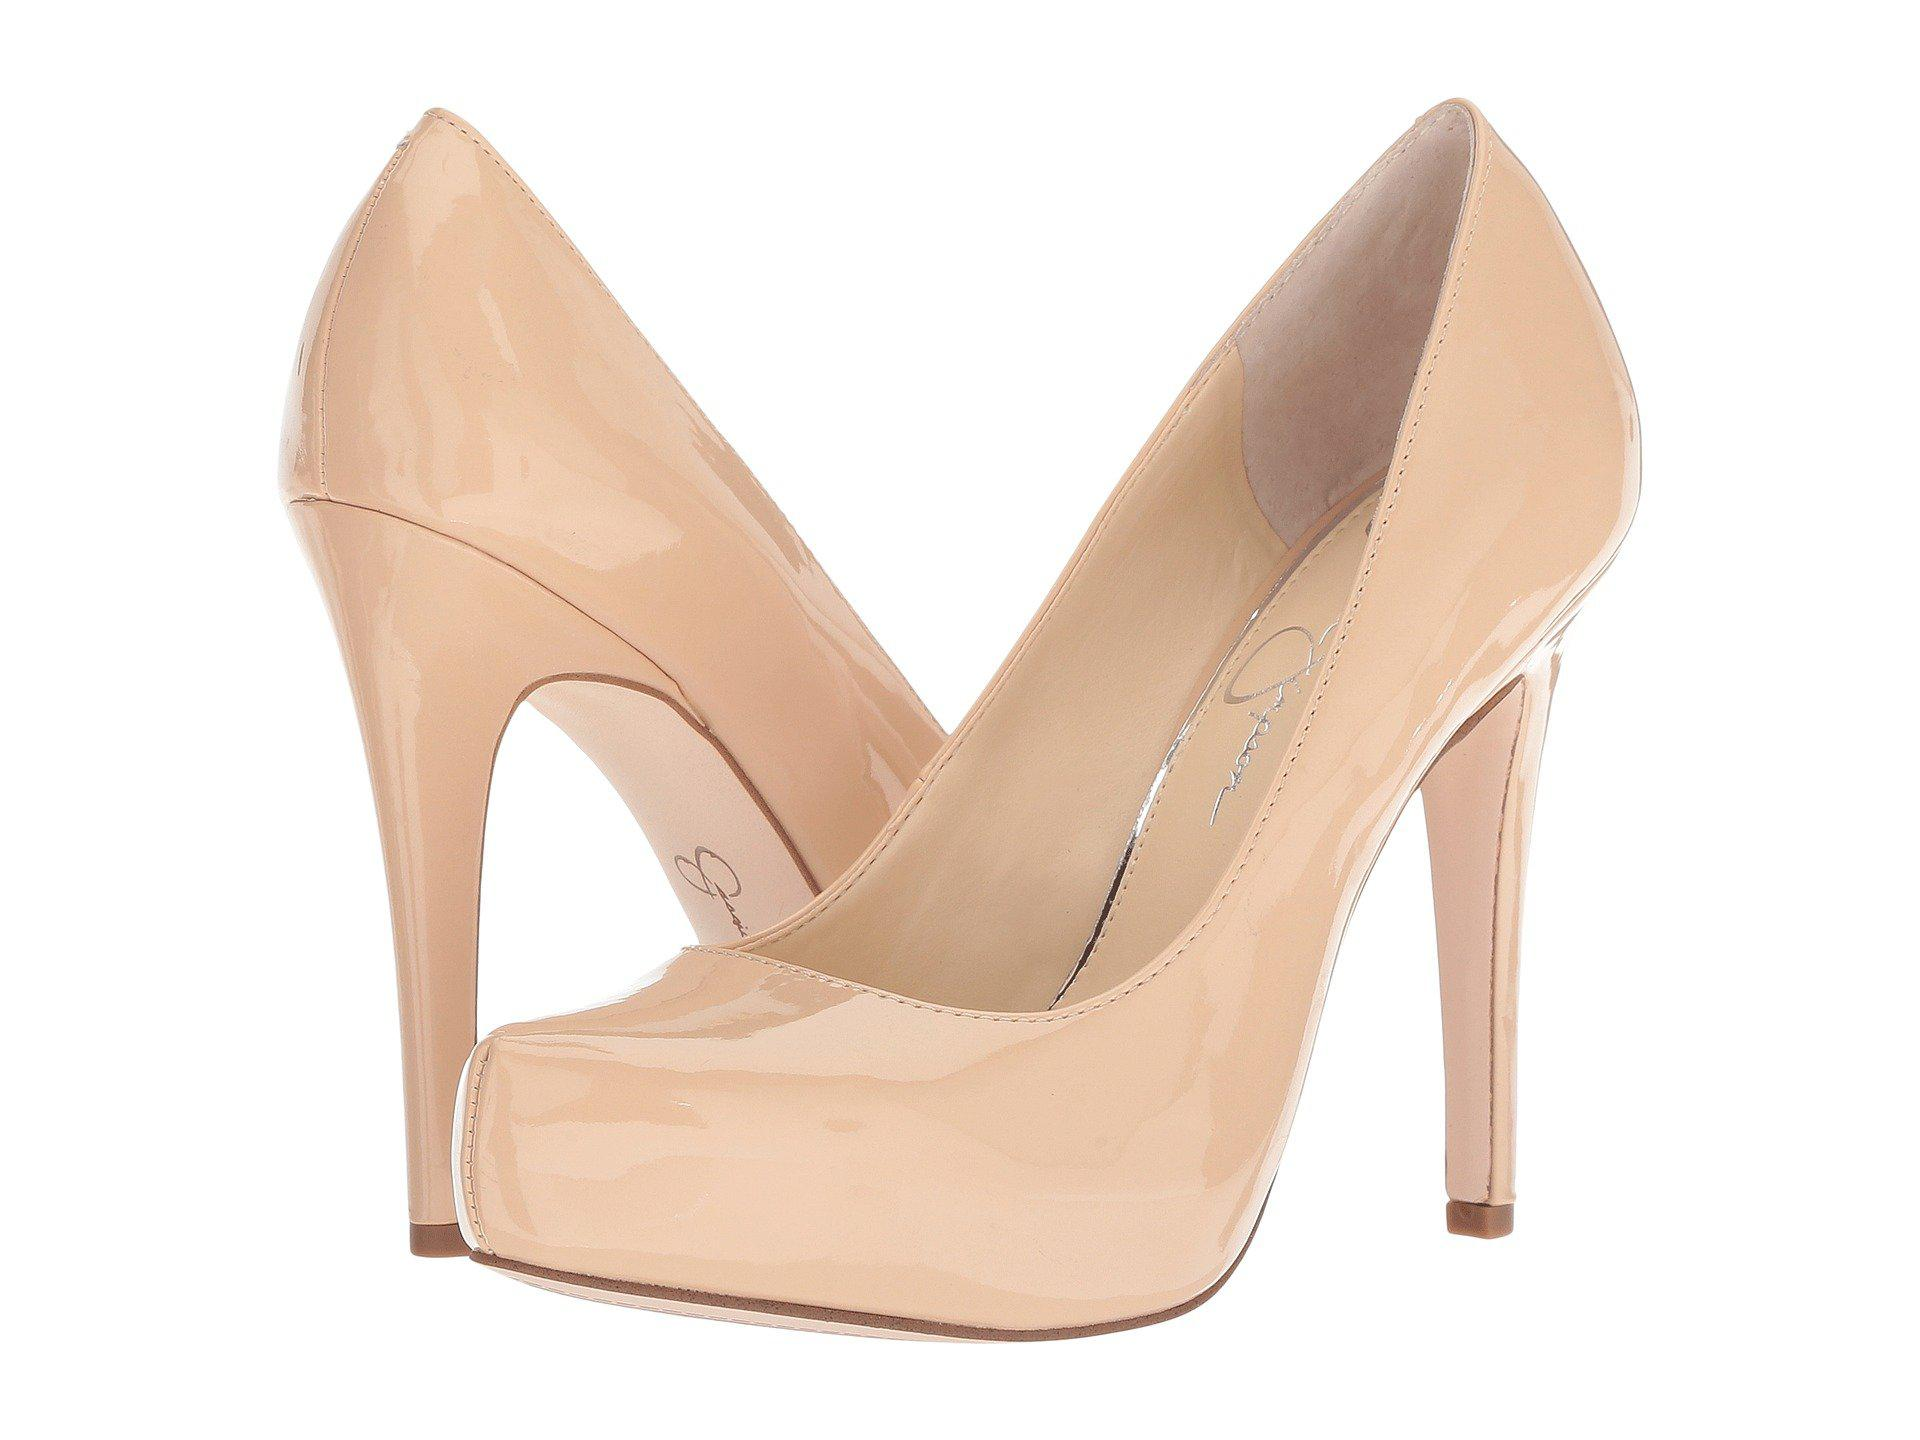 d9d48fc9a Lyst - Jessica Simpson Parisah (sand Dune Patent) High Heels in Natural